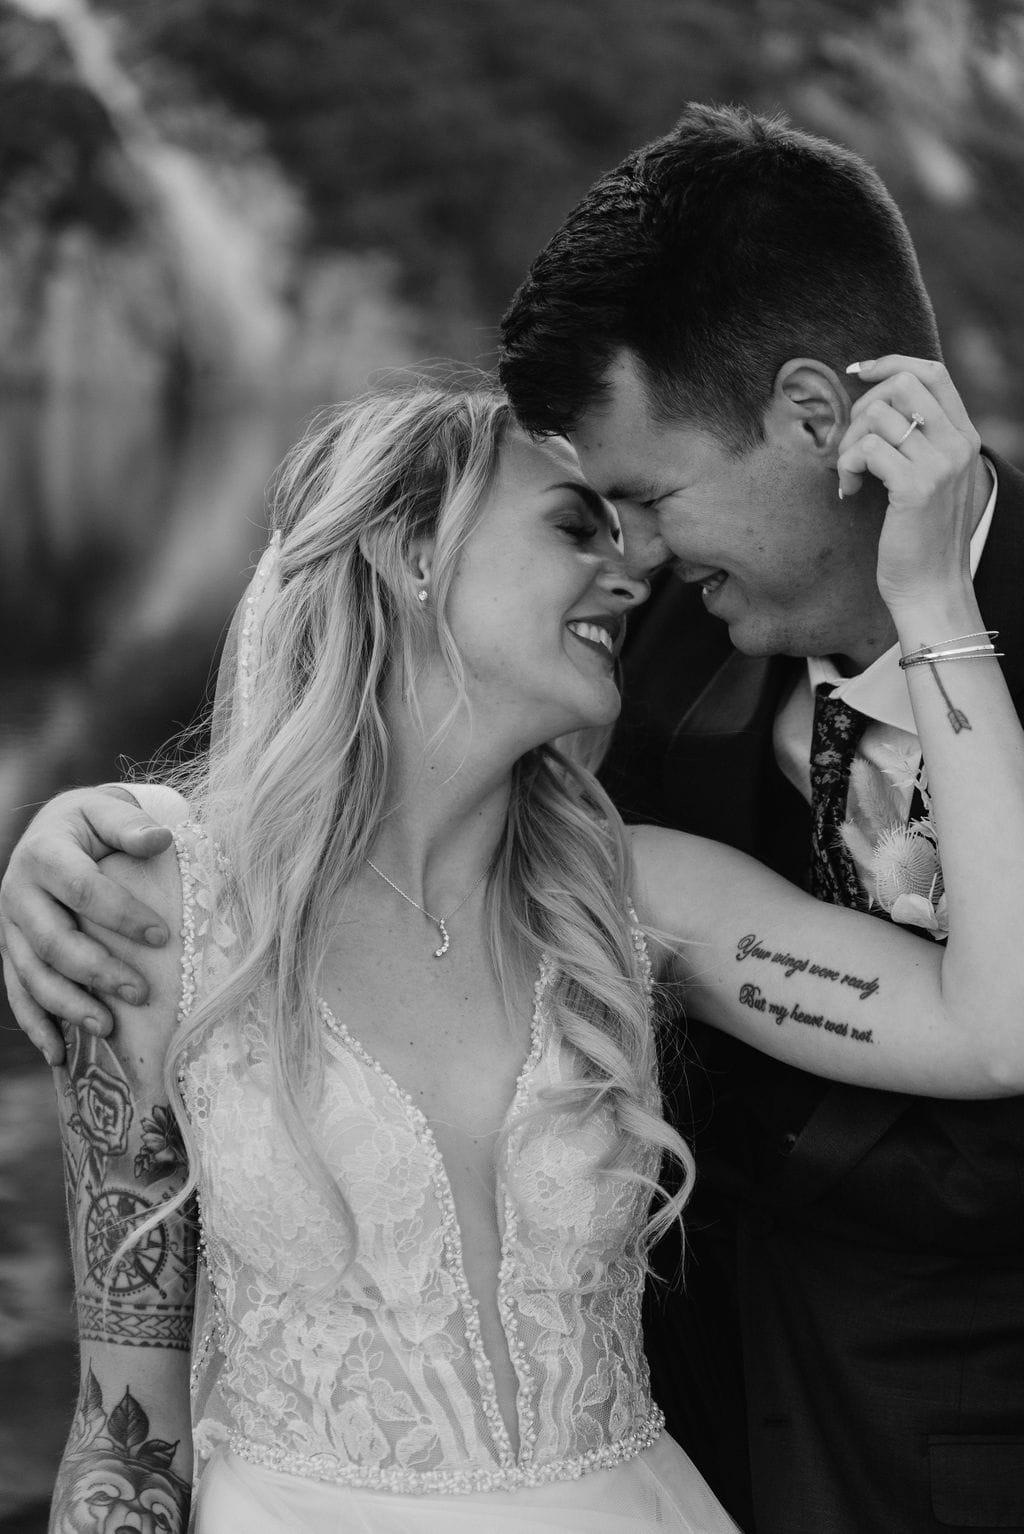 Romantic wedding portraits by St Marys Glacier